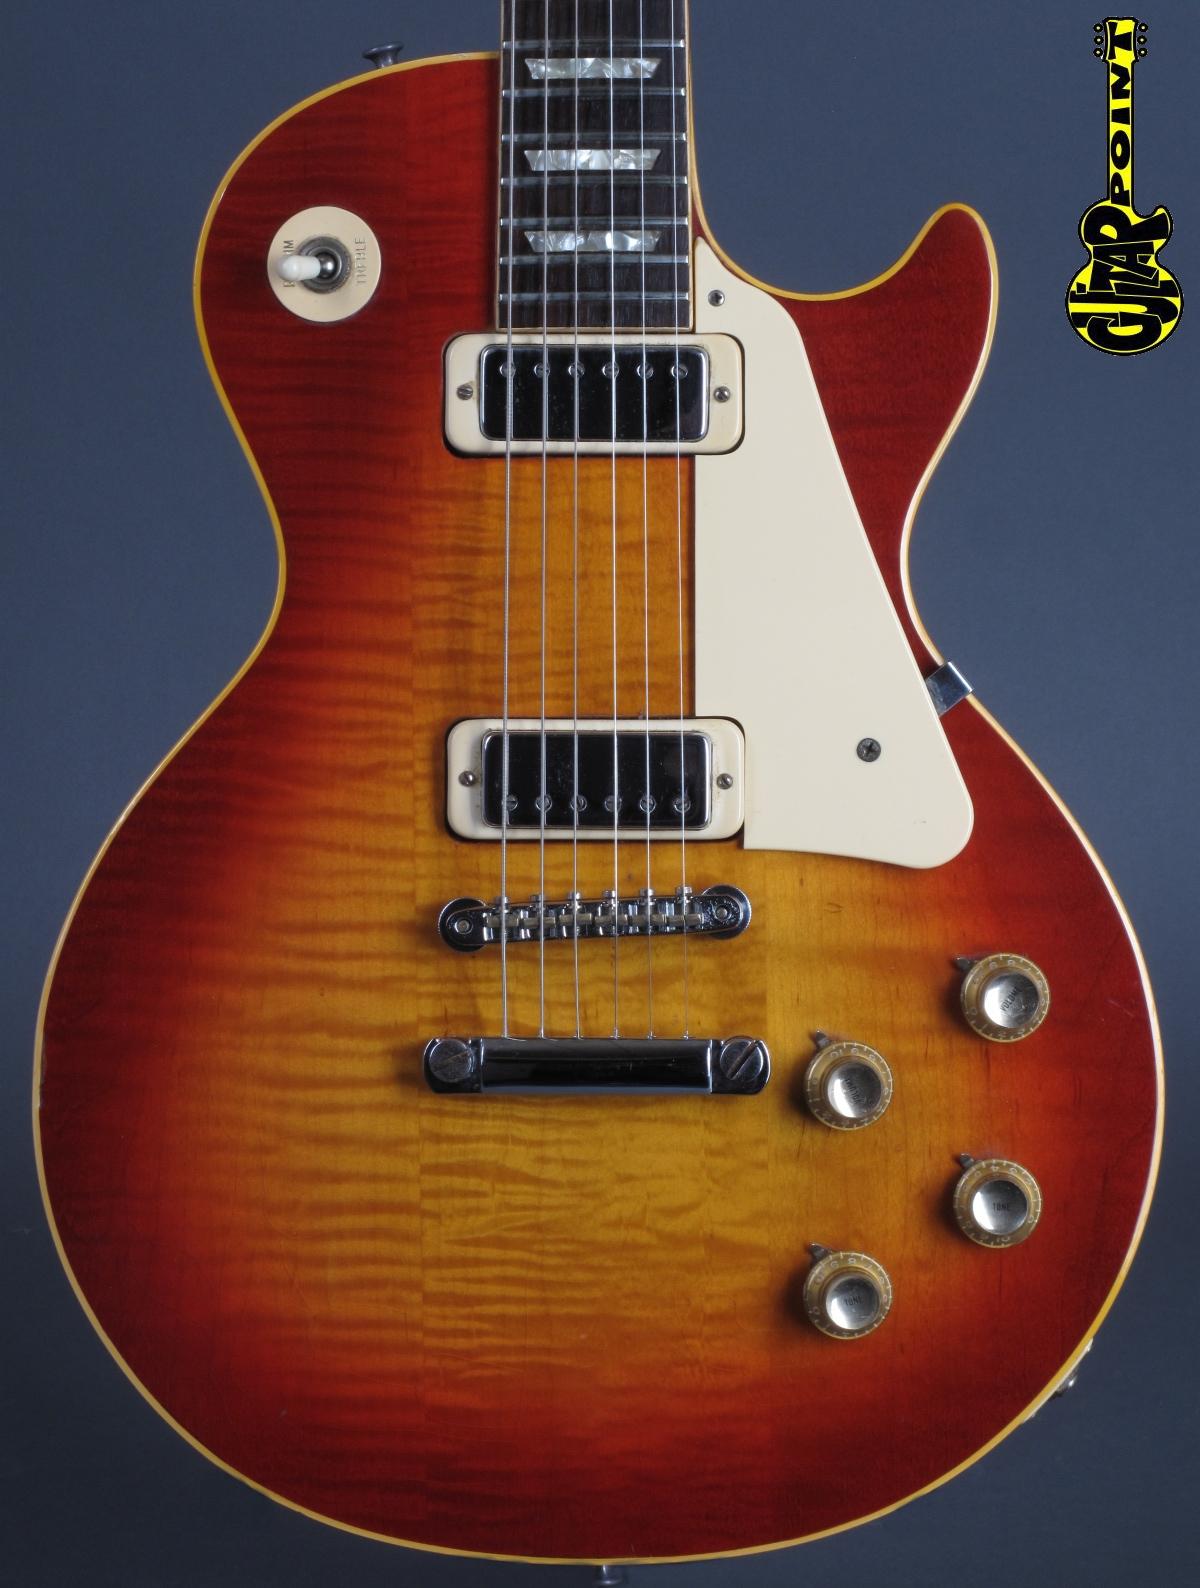 1973 Gibson Les Paul Deluxe - Cherry Sunburst  ...highly flamed !!!